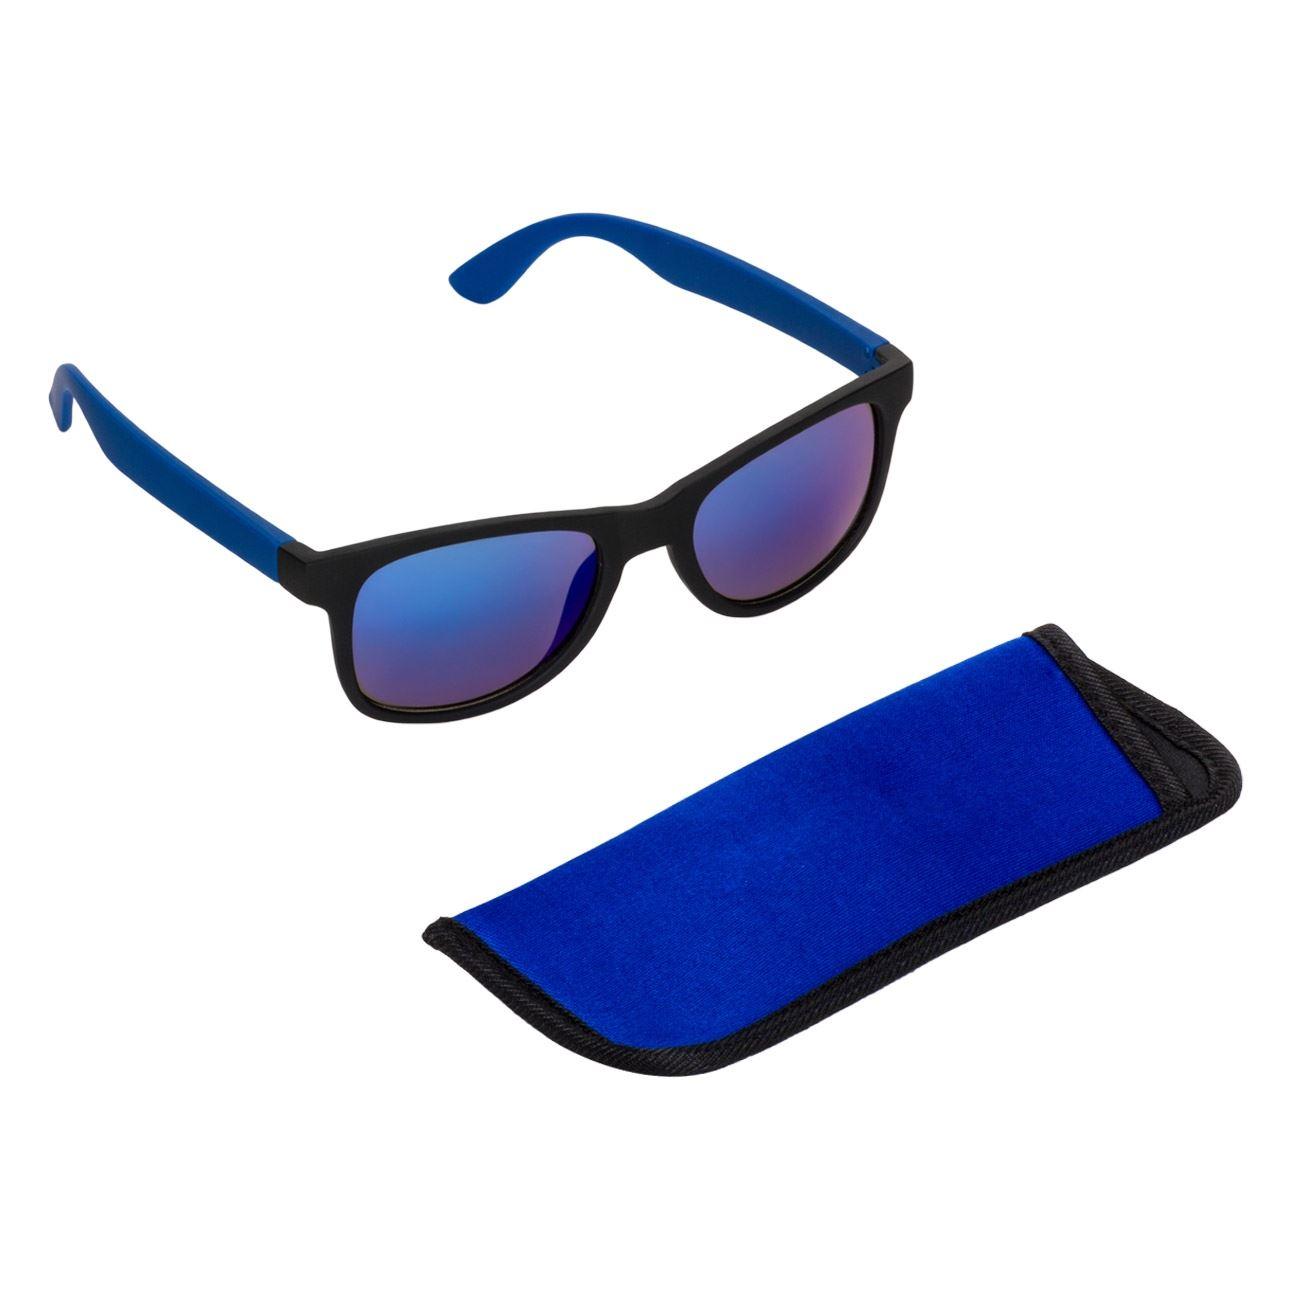 52cbba0f02 Γυαλιά Ηλίου Ανδρικά Rubber Μαύρα Καθρέφτες Μπλε   Γυαλιά Ηλίου Ενηλίκων